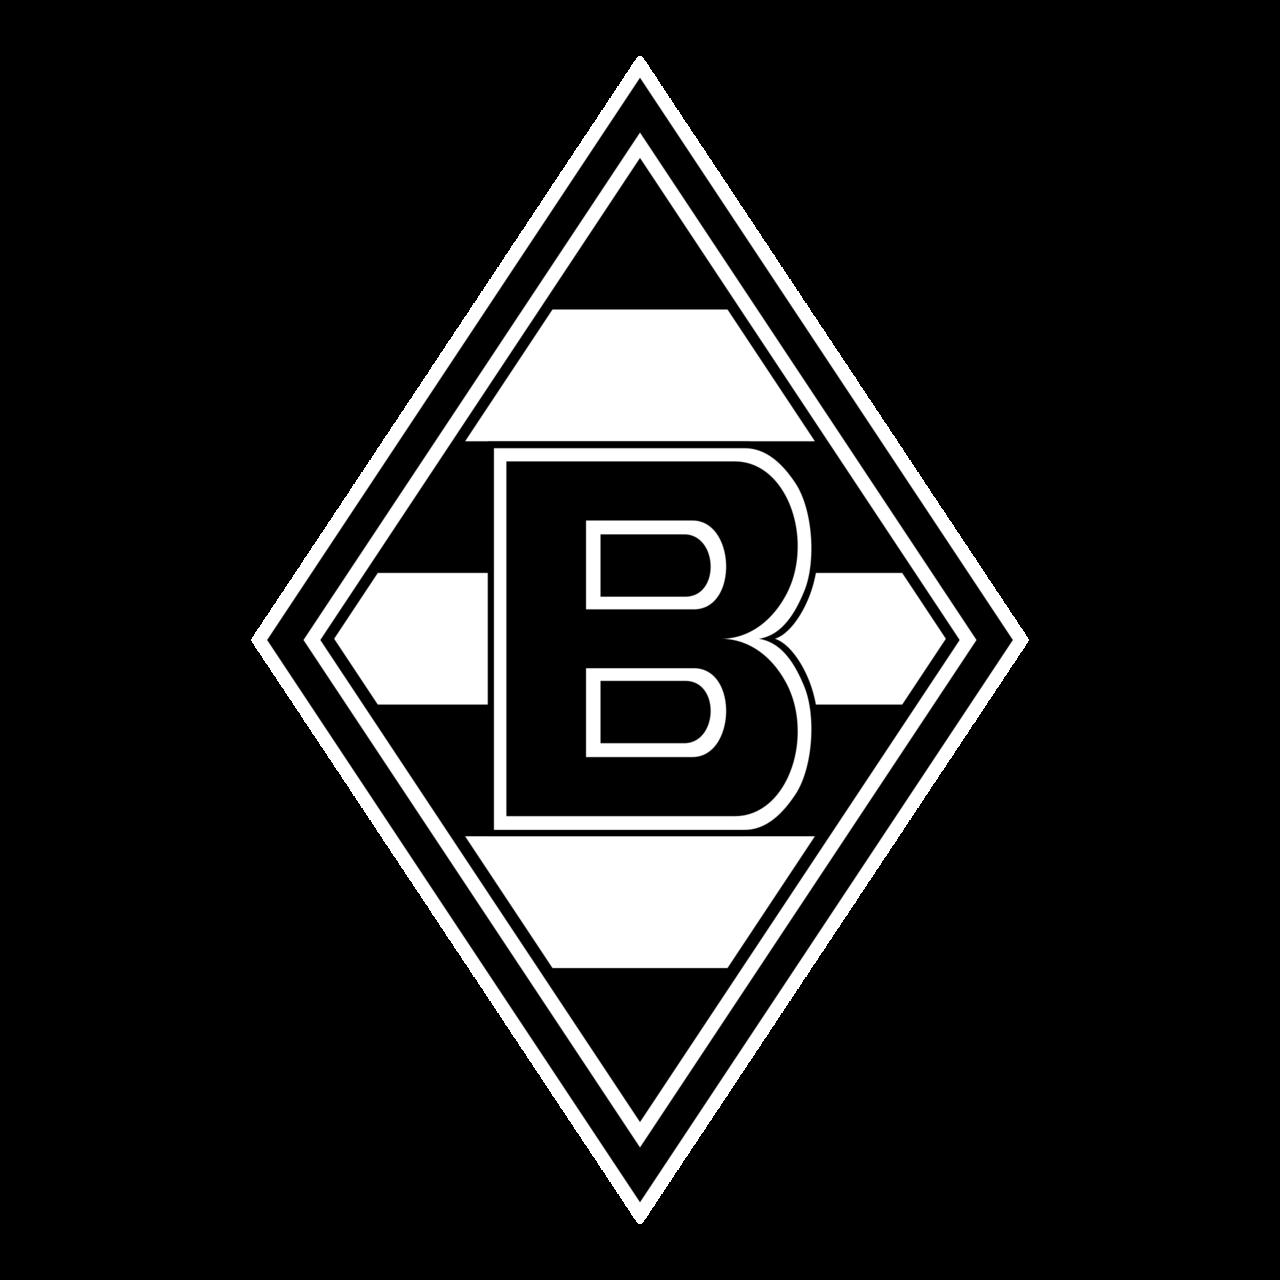 Borussia Monchengladbach Logo PNG Transparent - Brands Logos